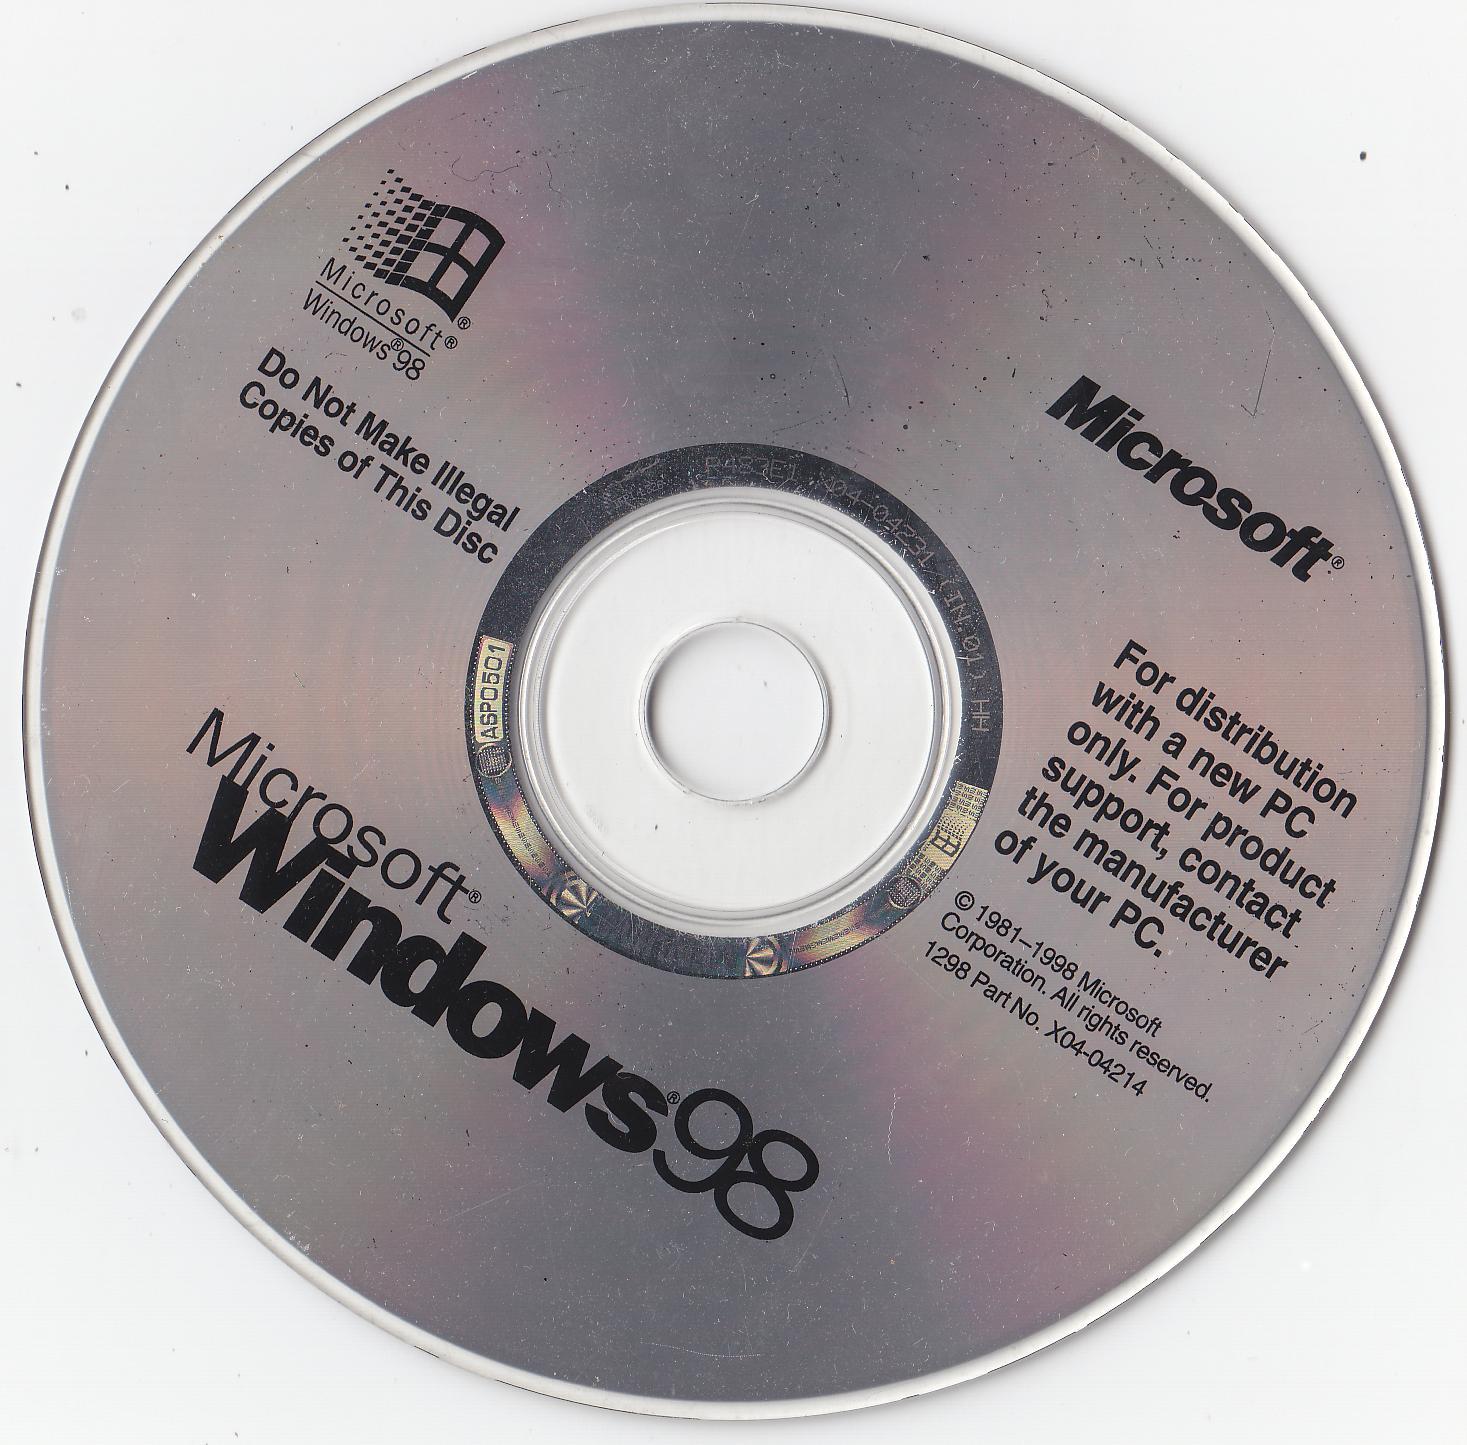 Bootable windows 98